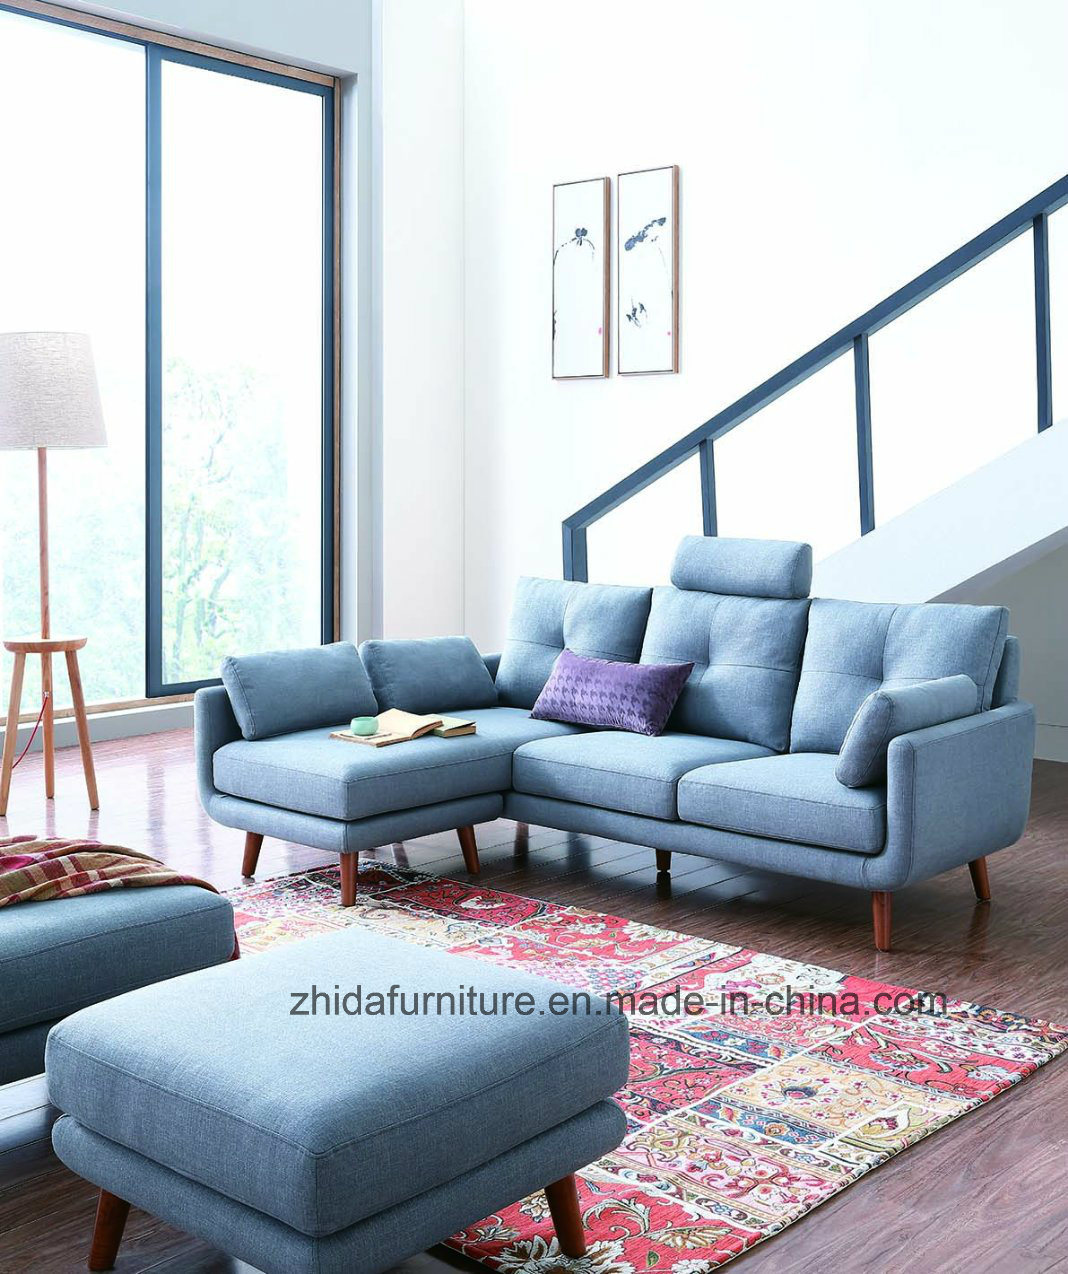 China Small Modern Living Room Fabric